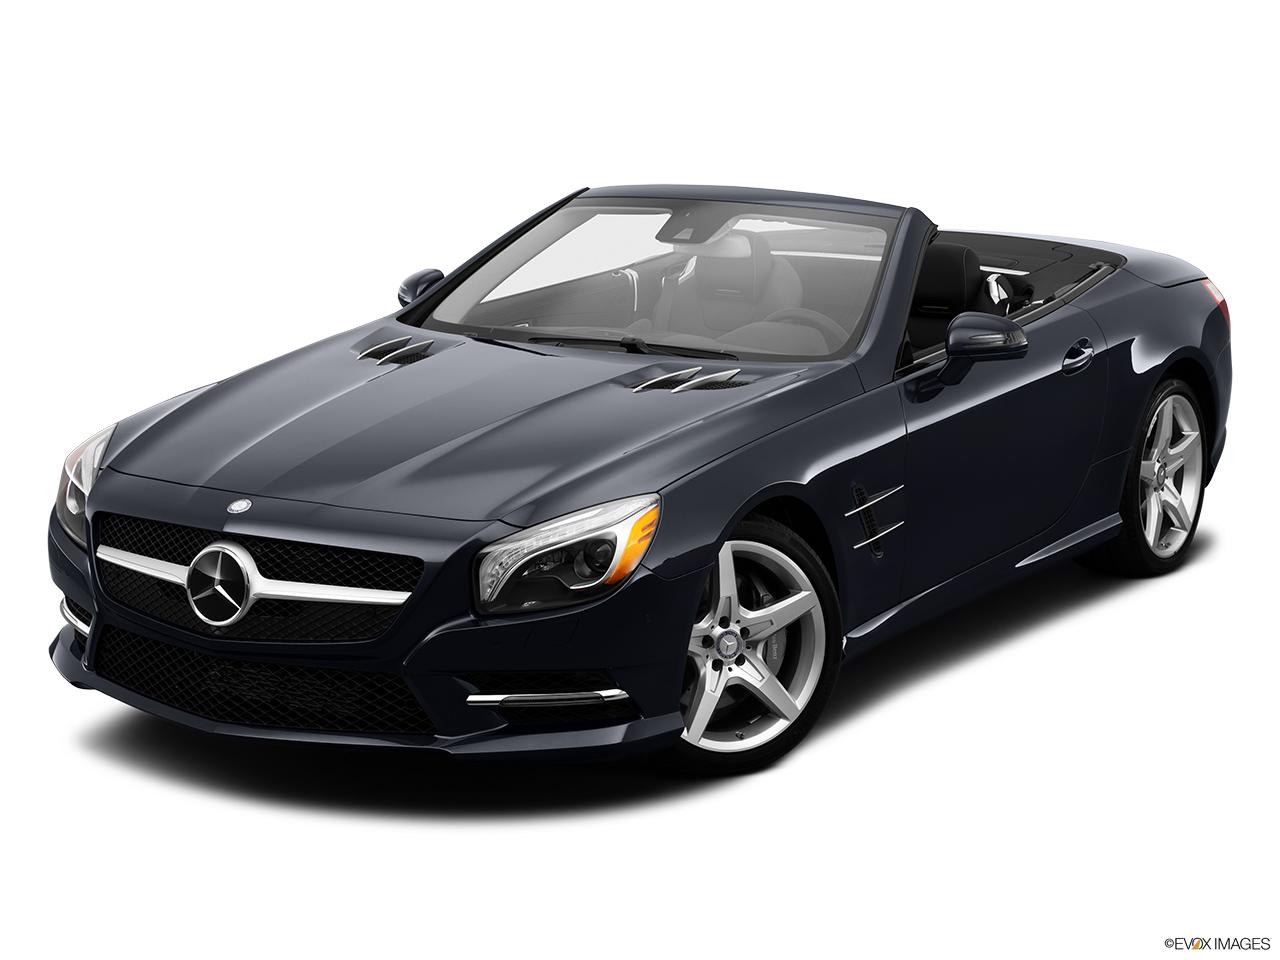 2014 mercedes benz sl class roadster sl550. Black Bedroom Furniture Sets. Home Design Ideas